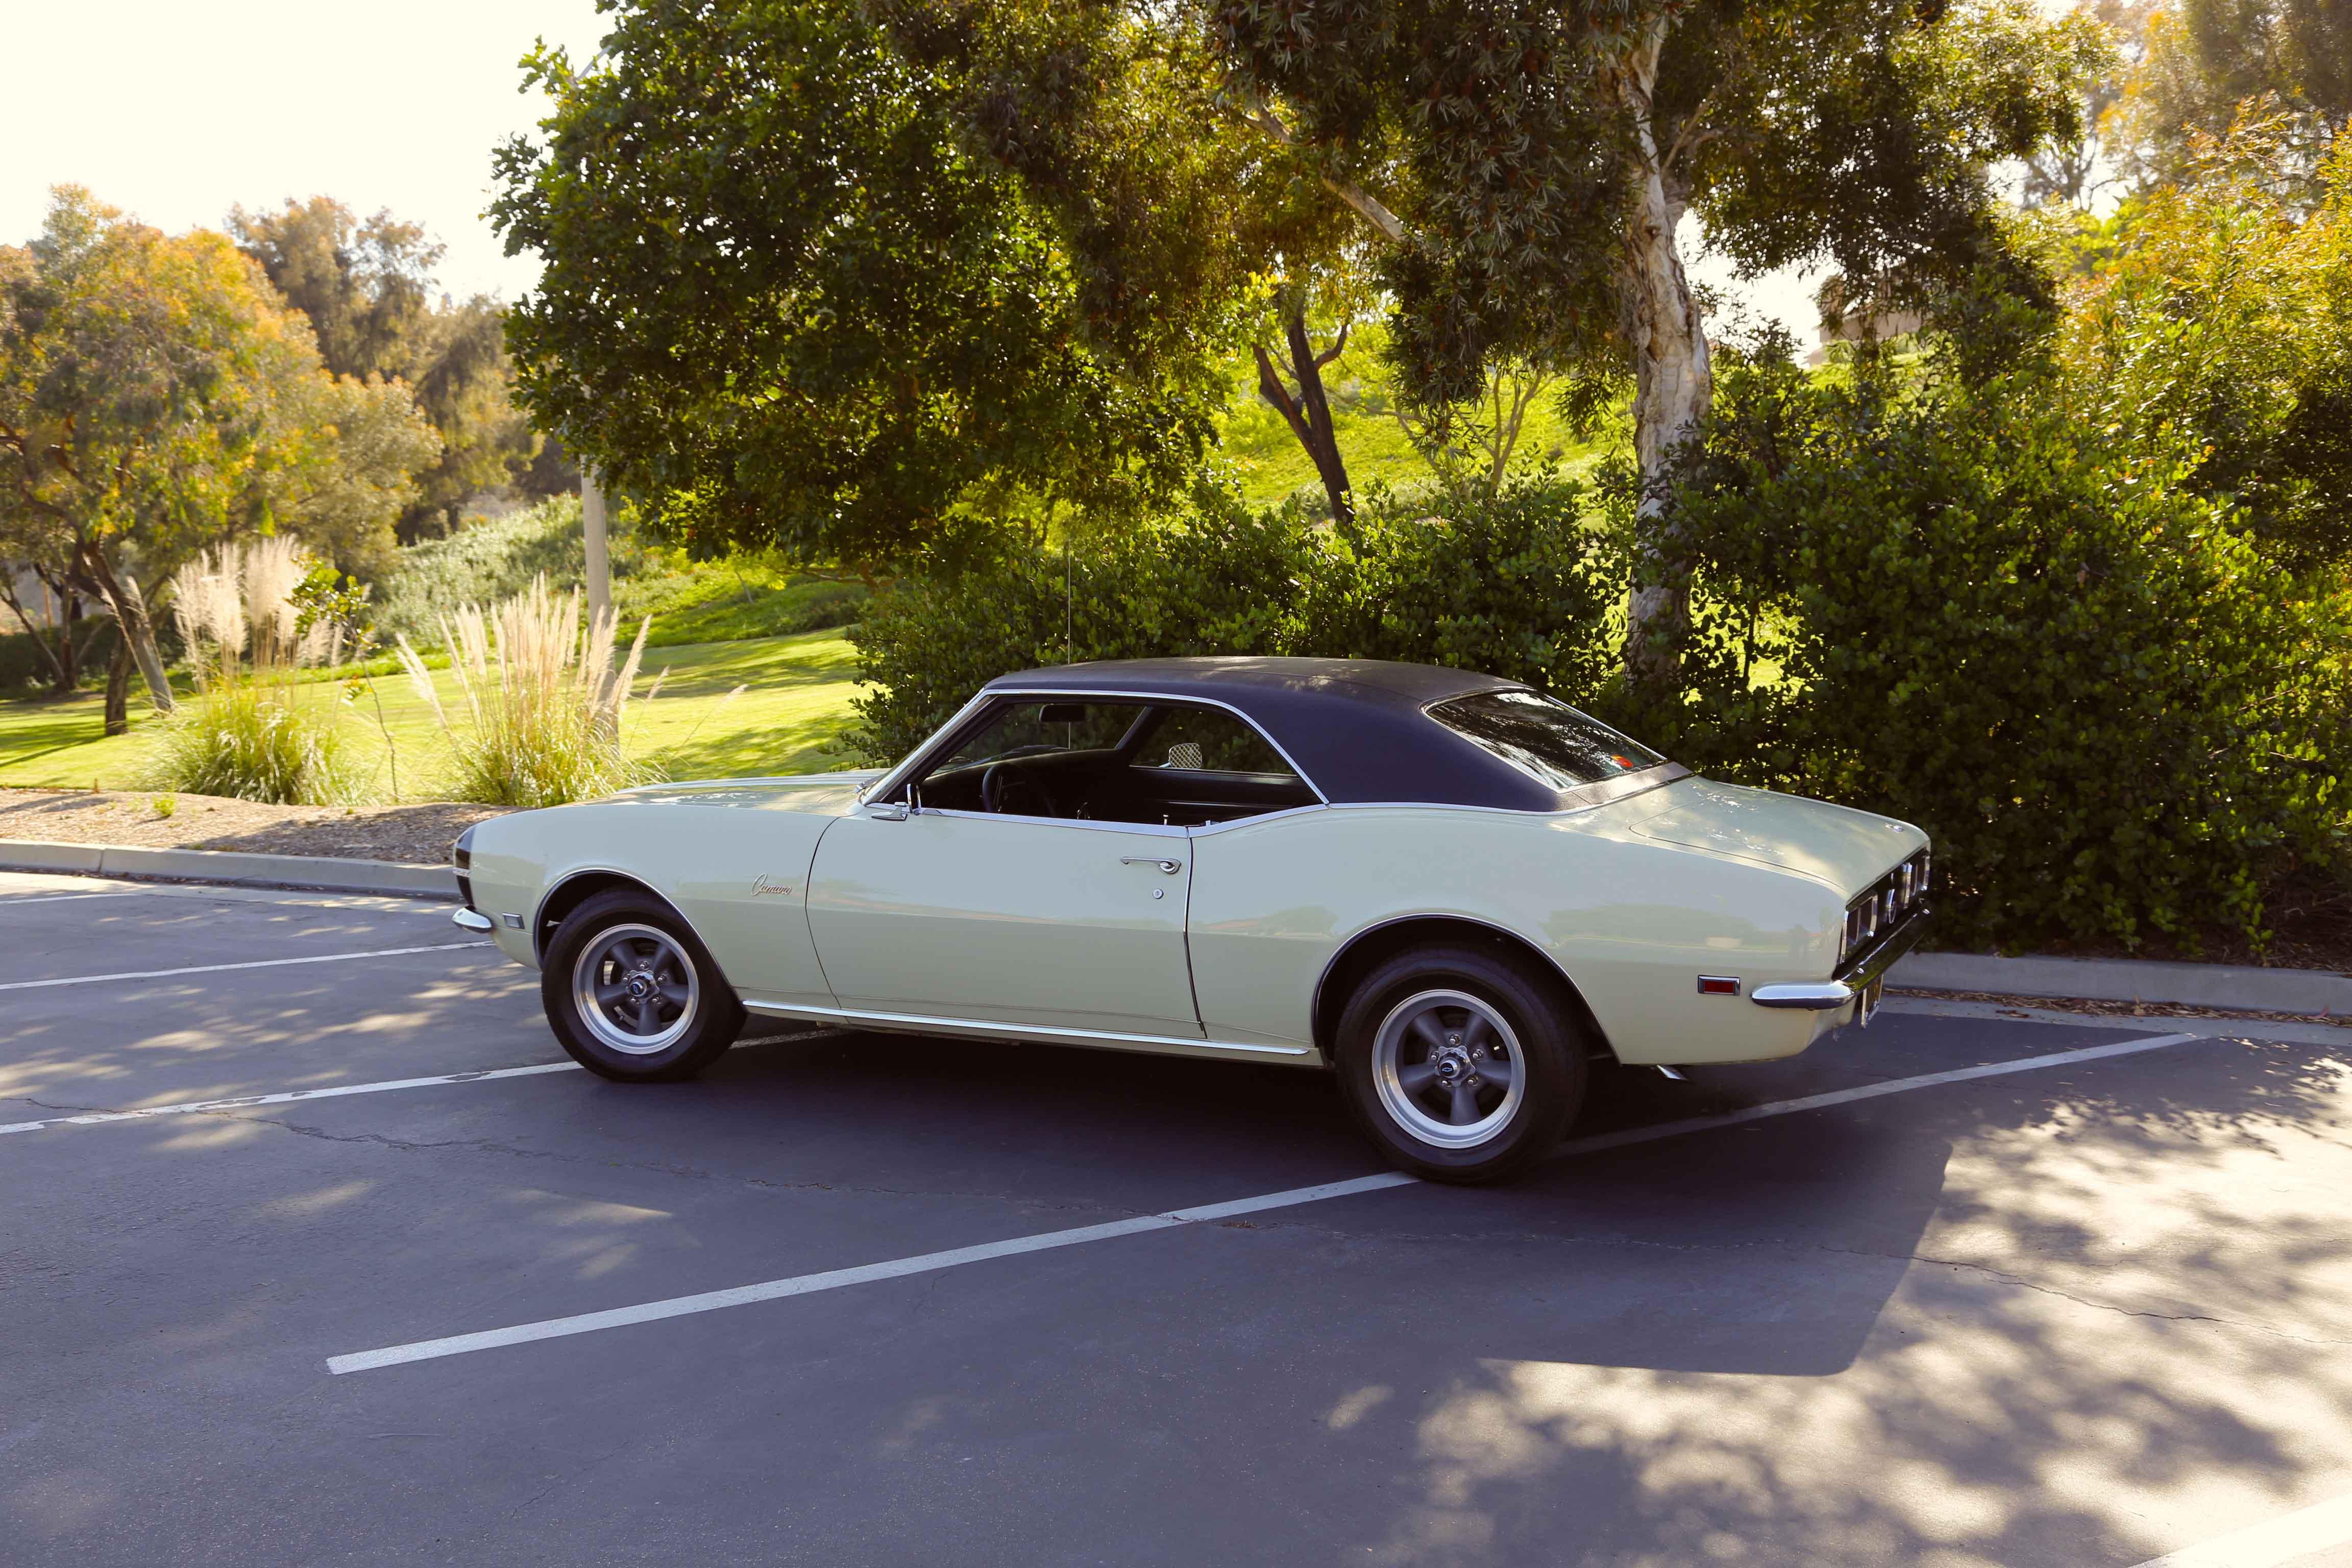 1968 Camaro Odd Options Side Profile